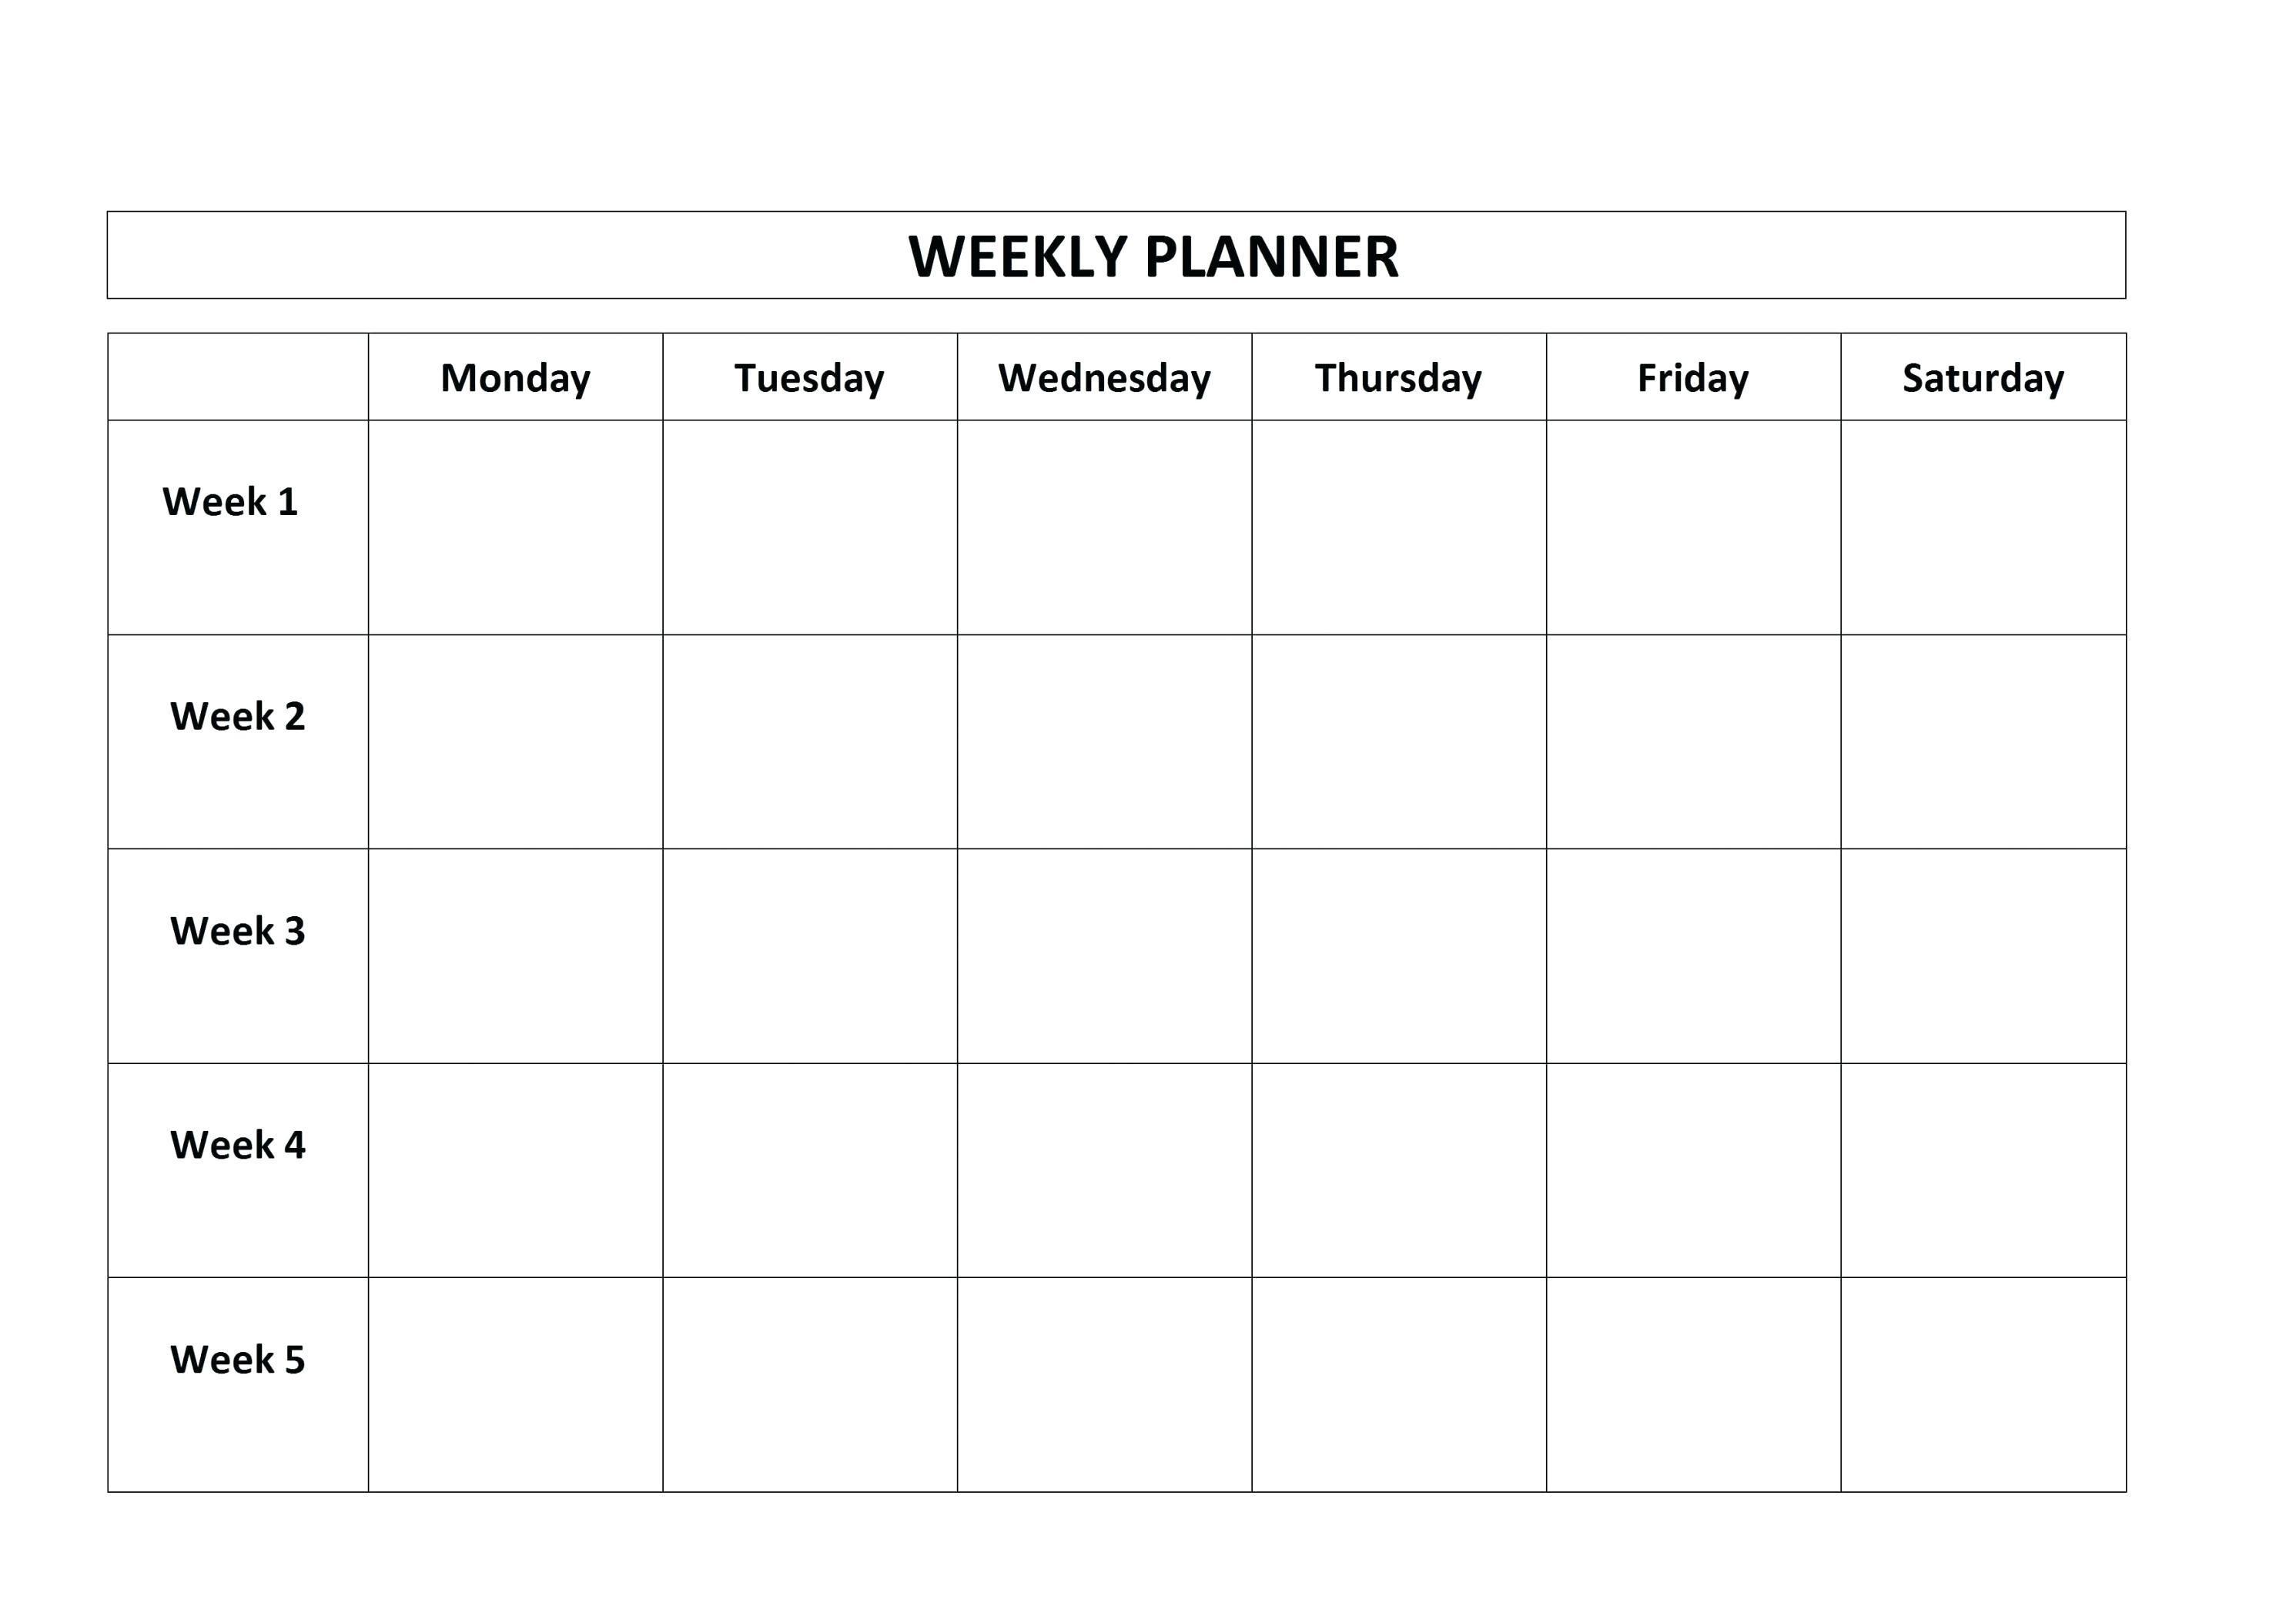 Schedule Template Two Week Calendar Excel Printable | Smorad for Two-Week Calendar Template Word Printable